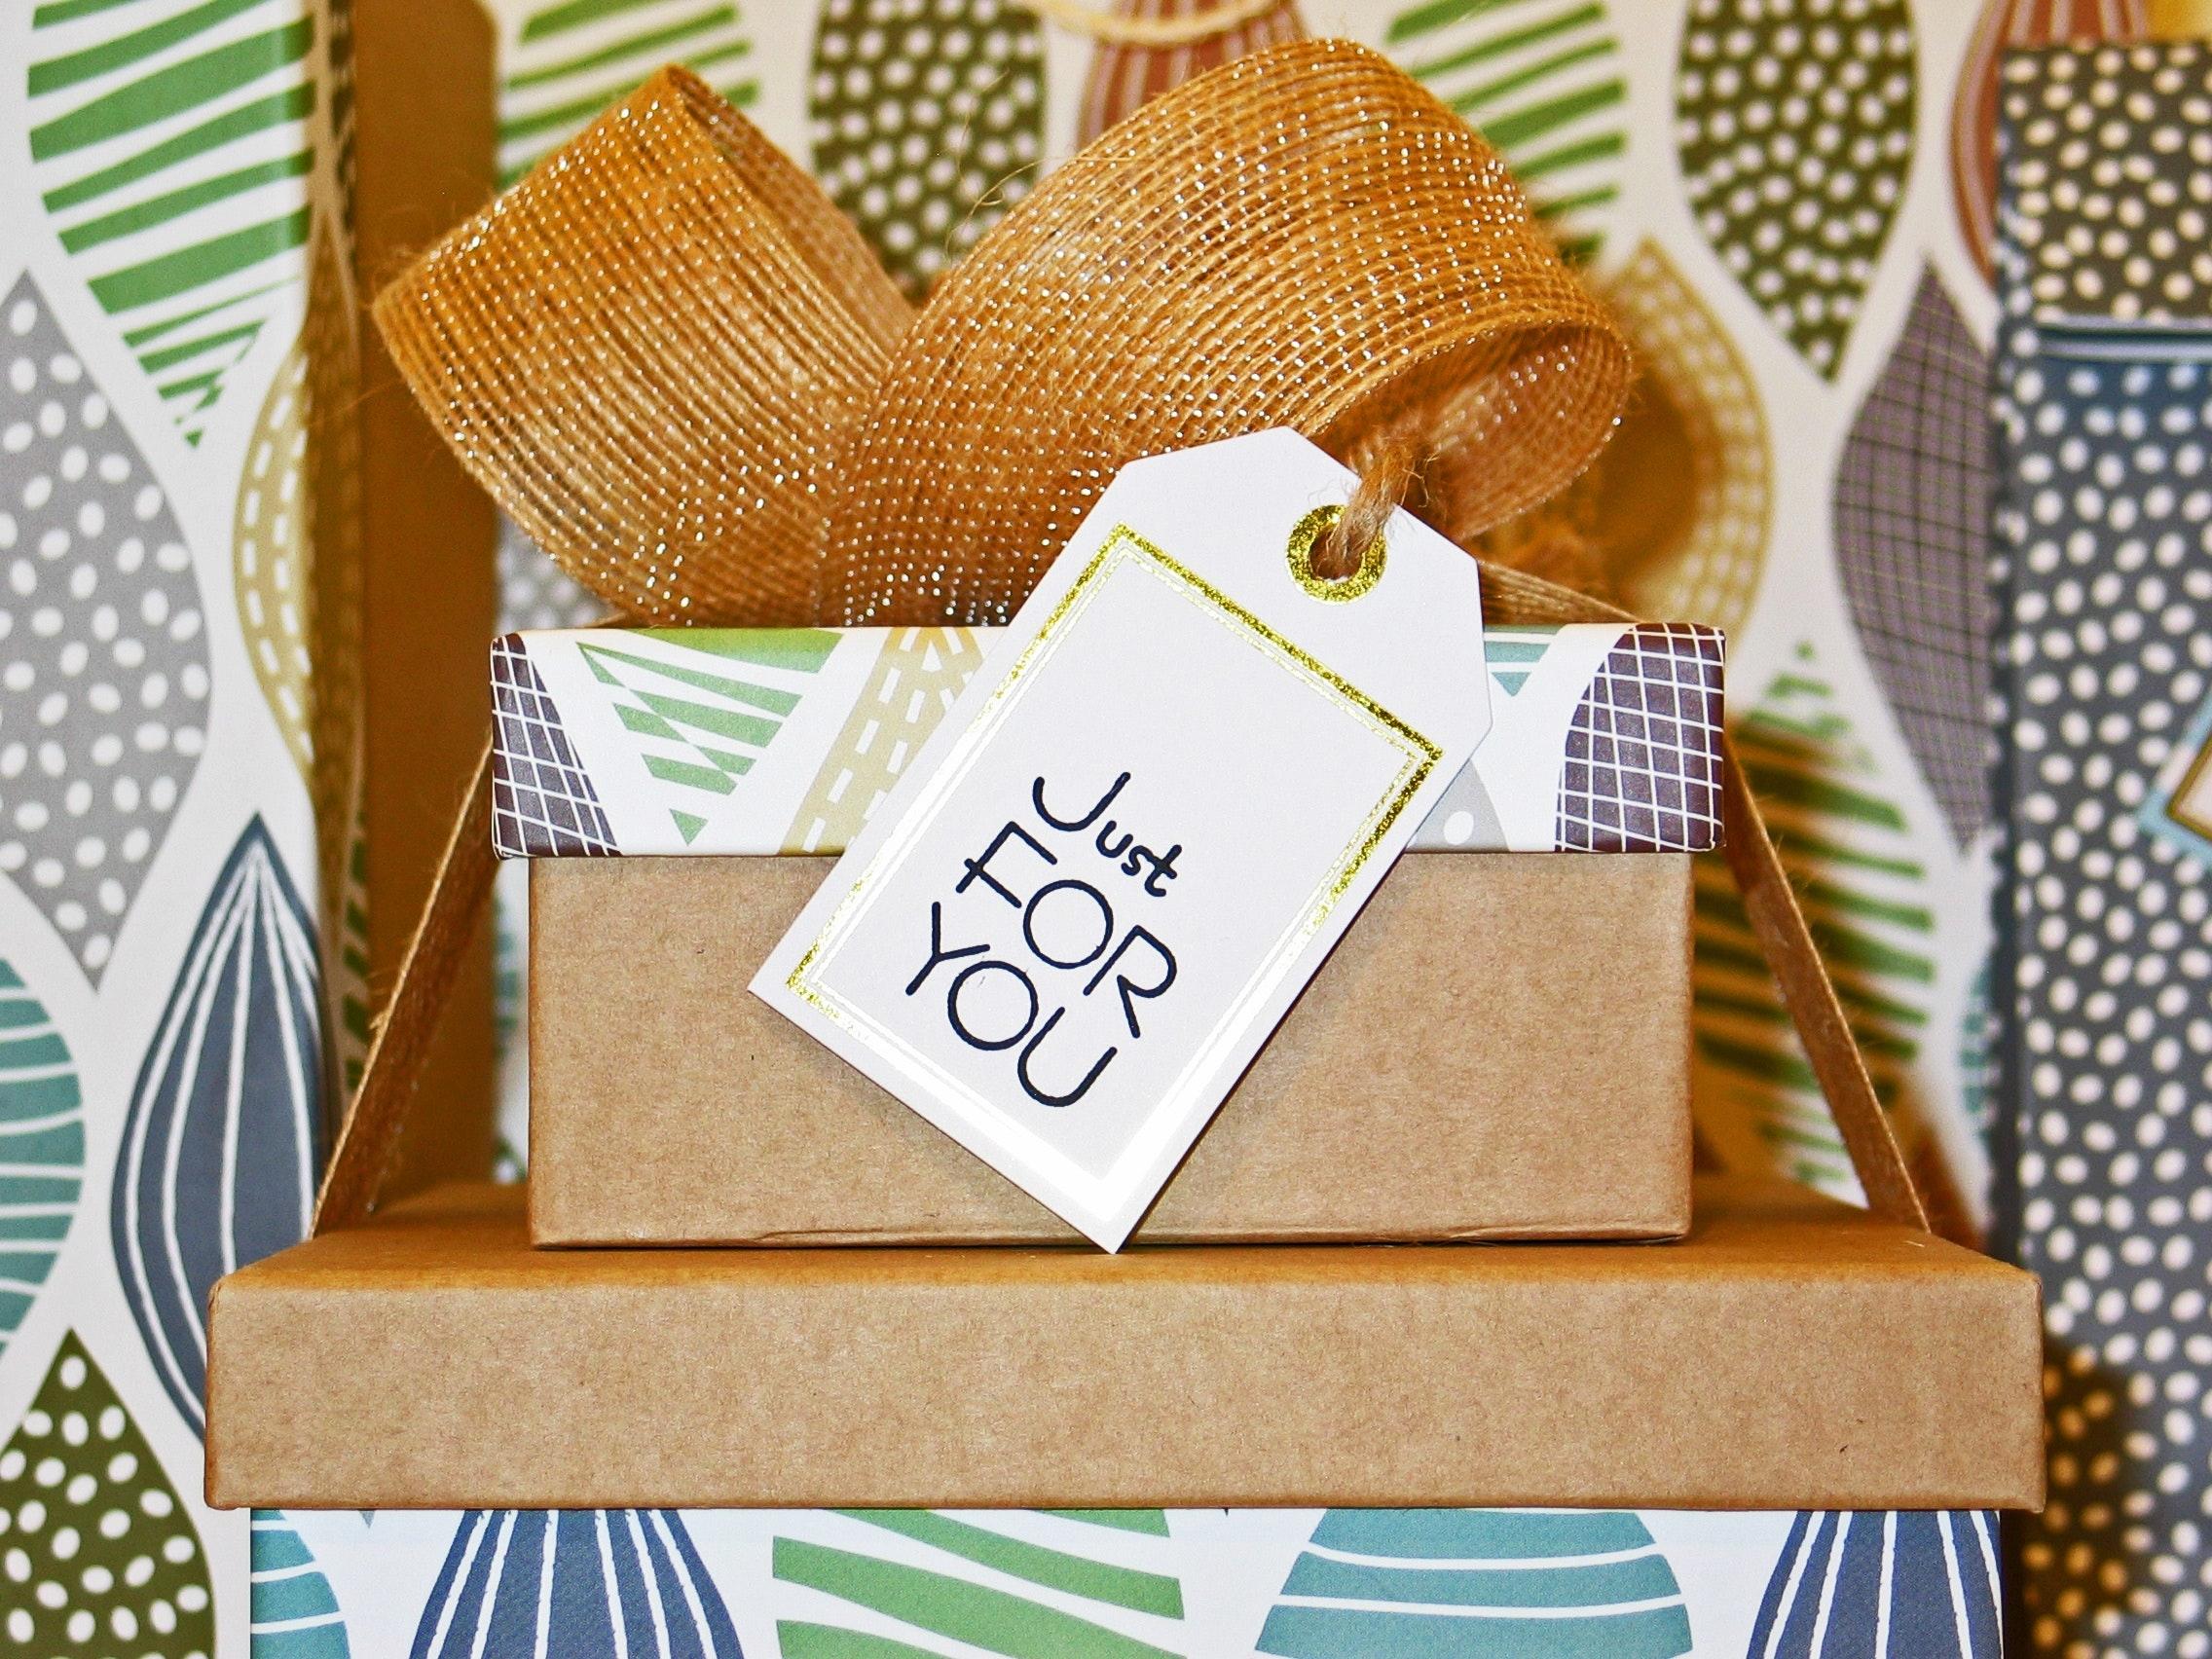 birthday-bow-card-264771